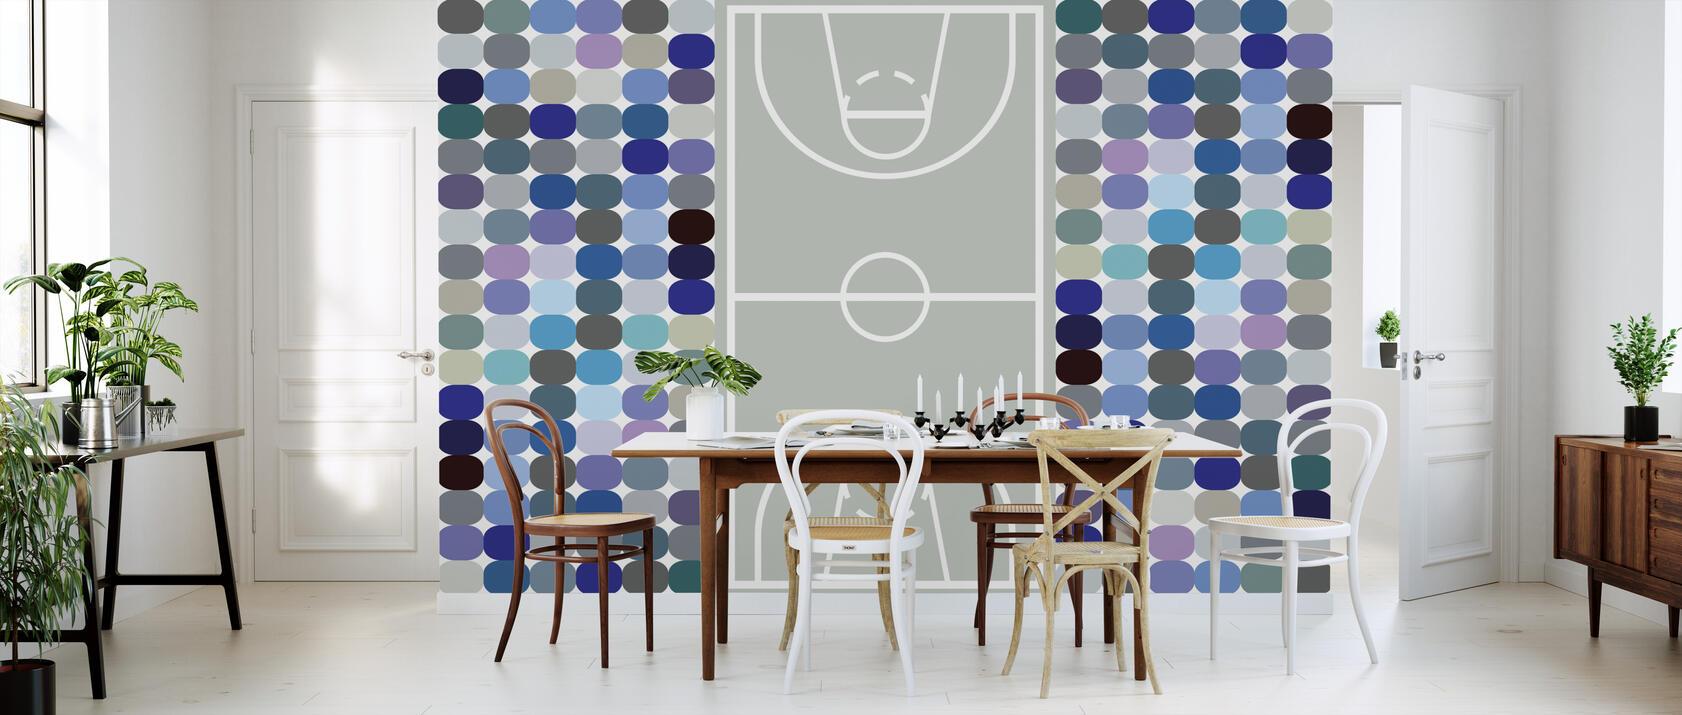 basketball mit fototapeten einrichten photowall. Black Bedroom Furniture Sets. Home Design Ideas